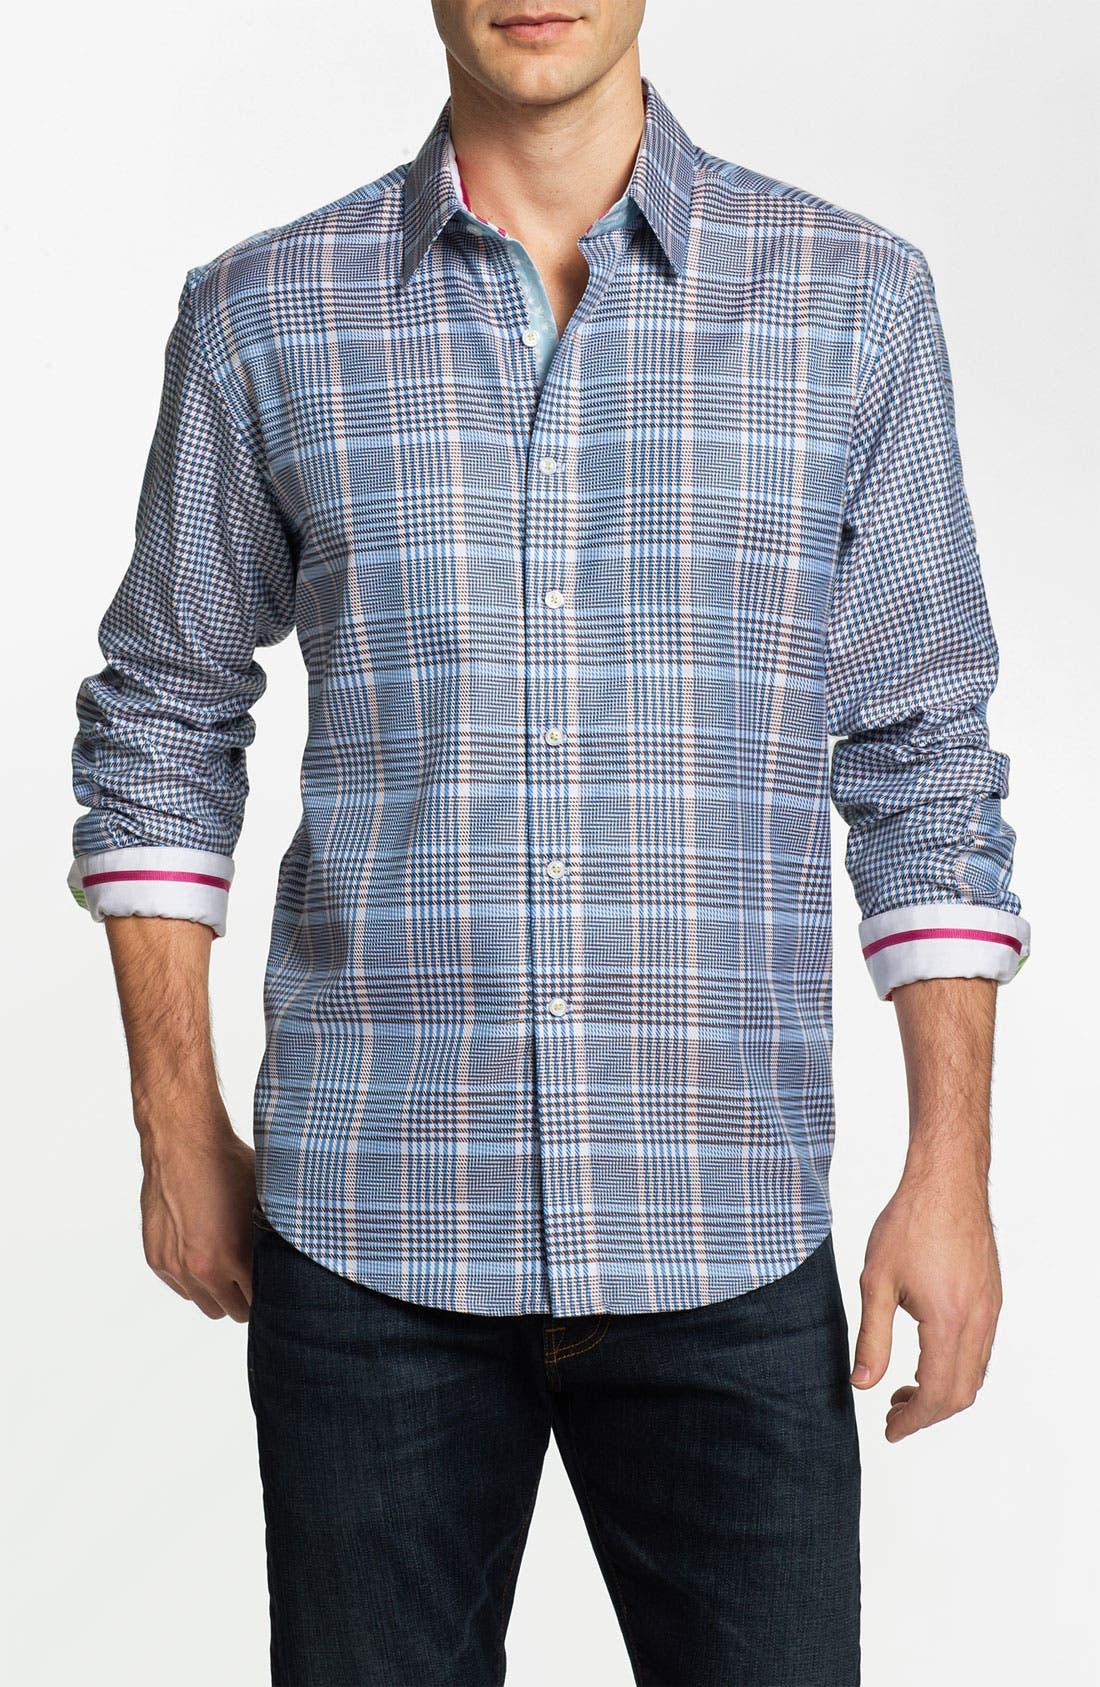 Alternate Image 1 Selected - Robert Graham 'Swizzle' Sport Shirt